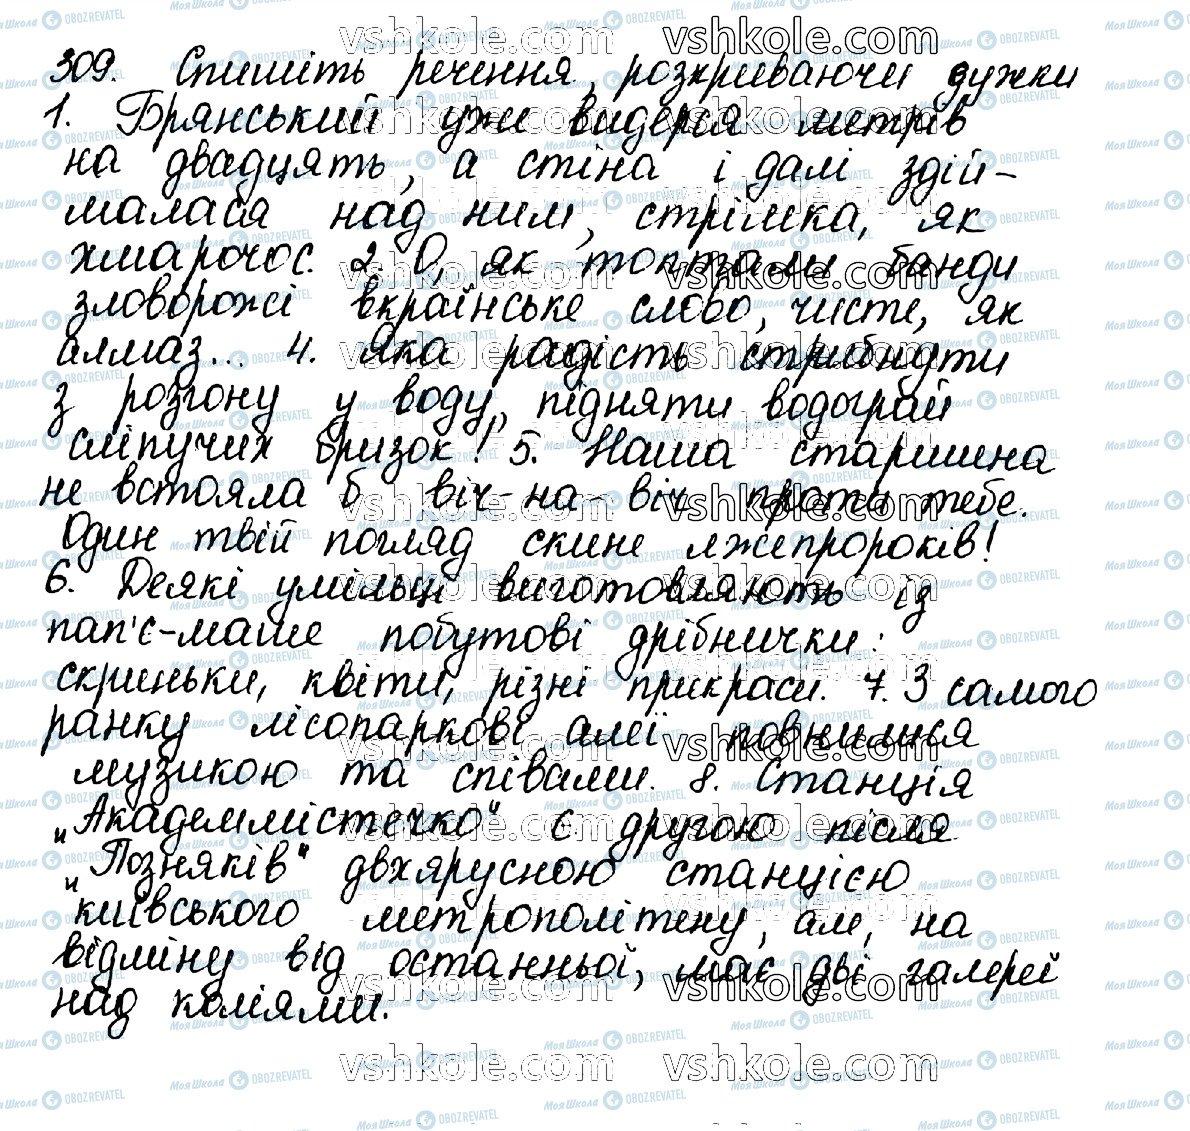 ГДЗ Укр мова 10 класс страница 309